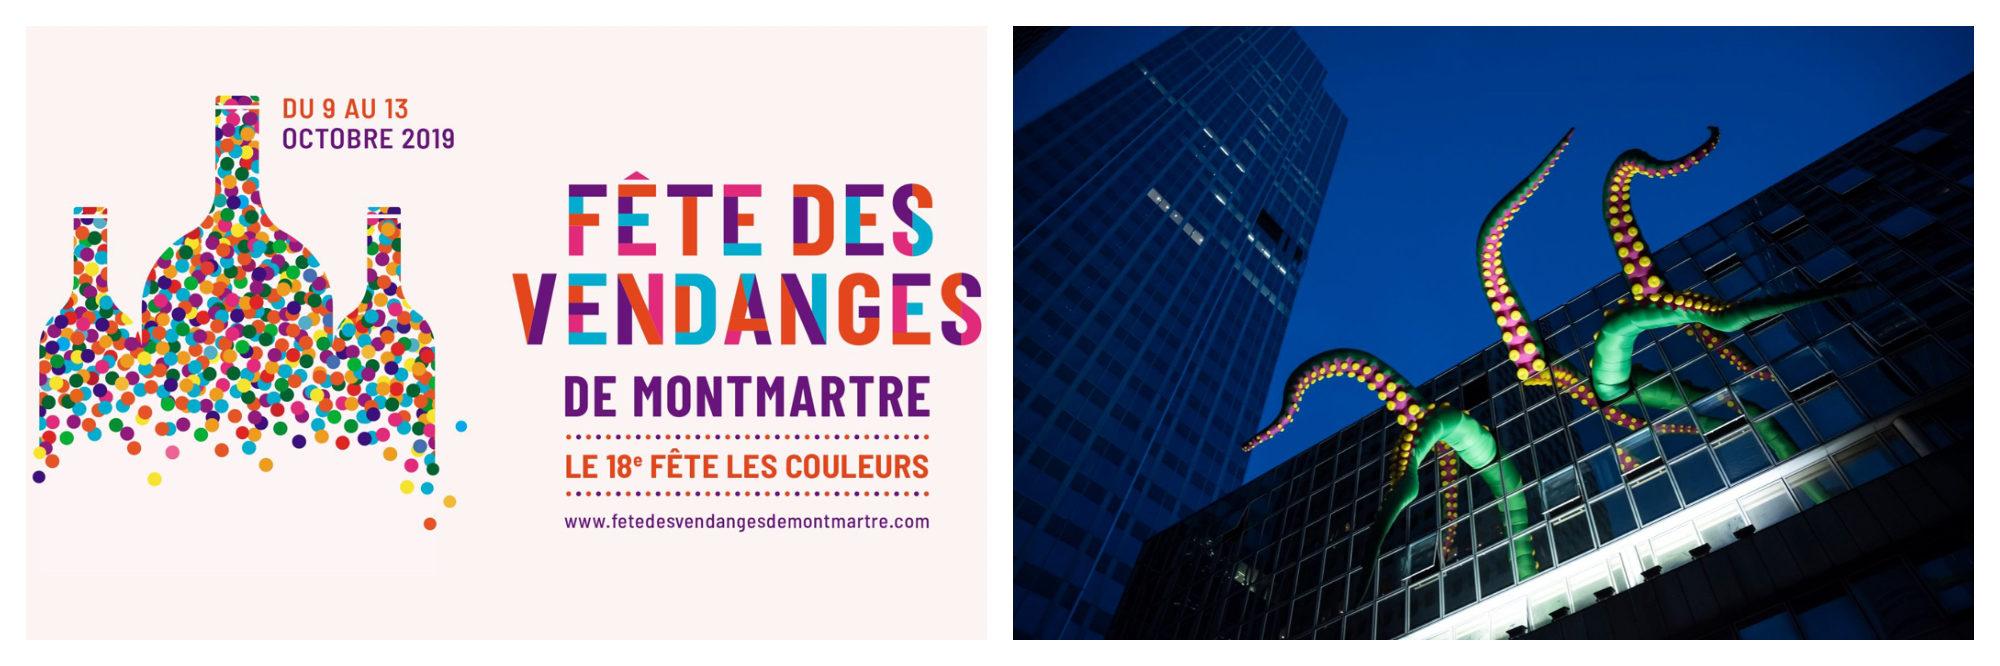 A poster for the Fete des Vendanges (grape harvest) in Montmartre (left). Green tentacles peeking out of a building during Paris's Nuit Blanche art festival (right).